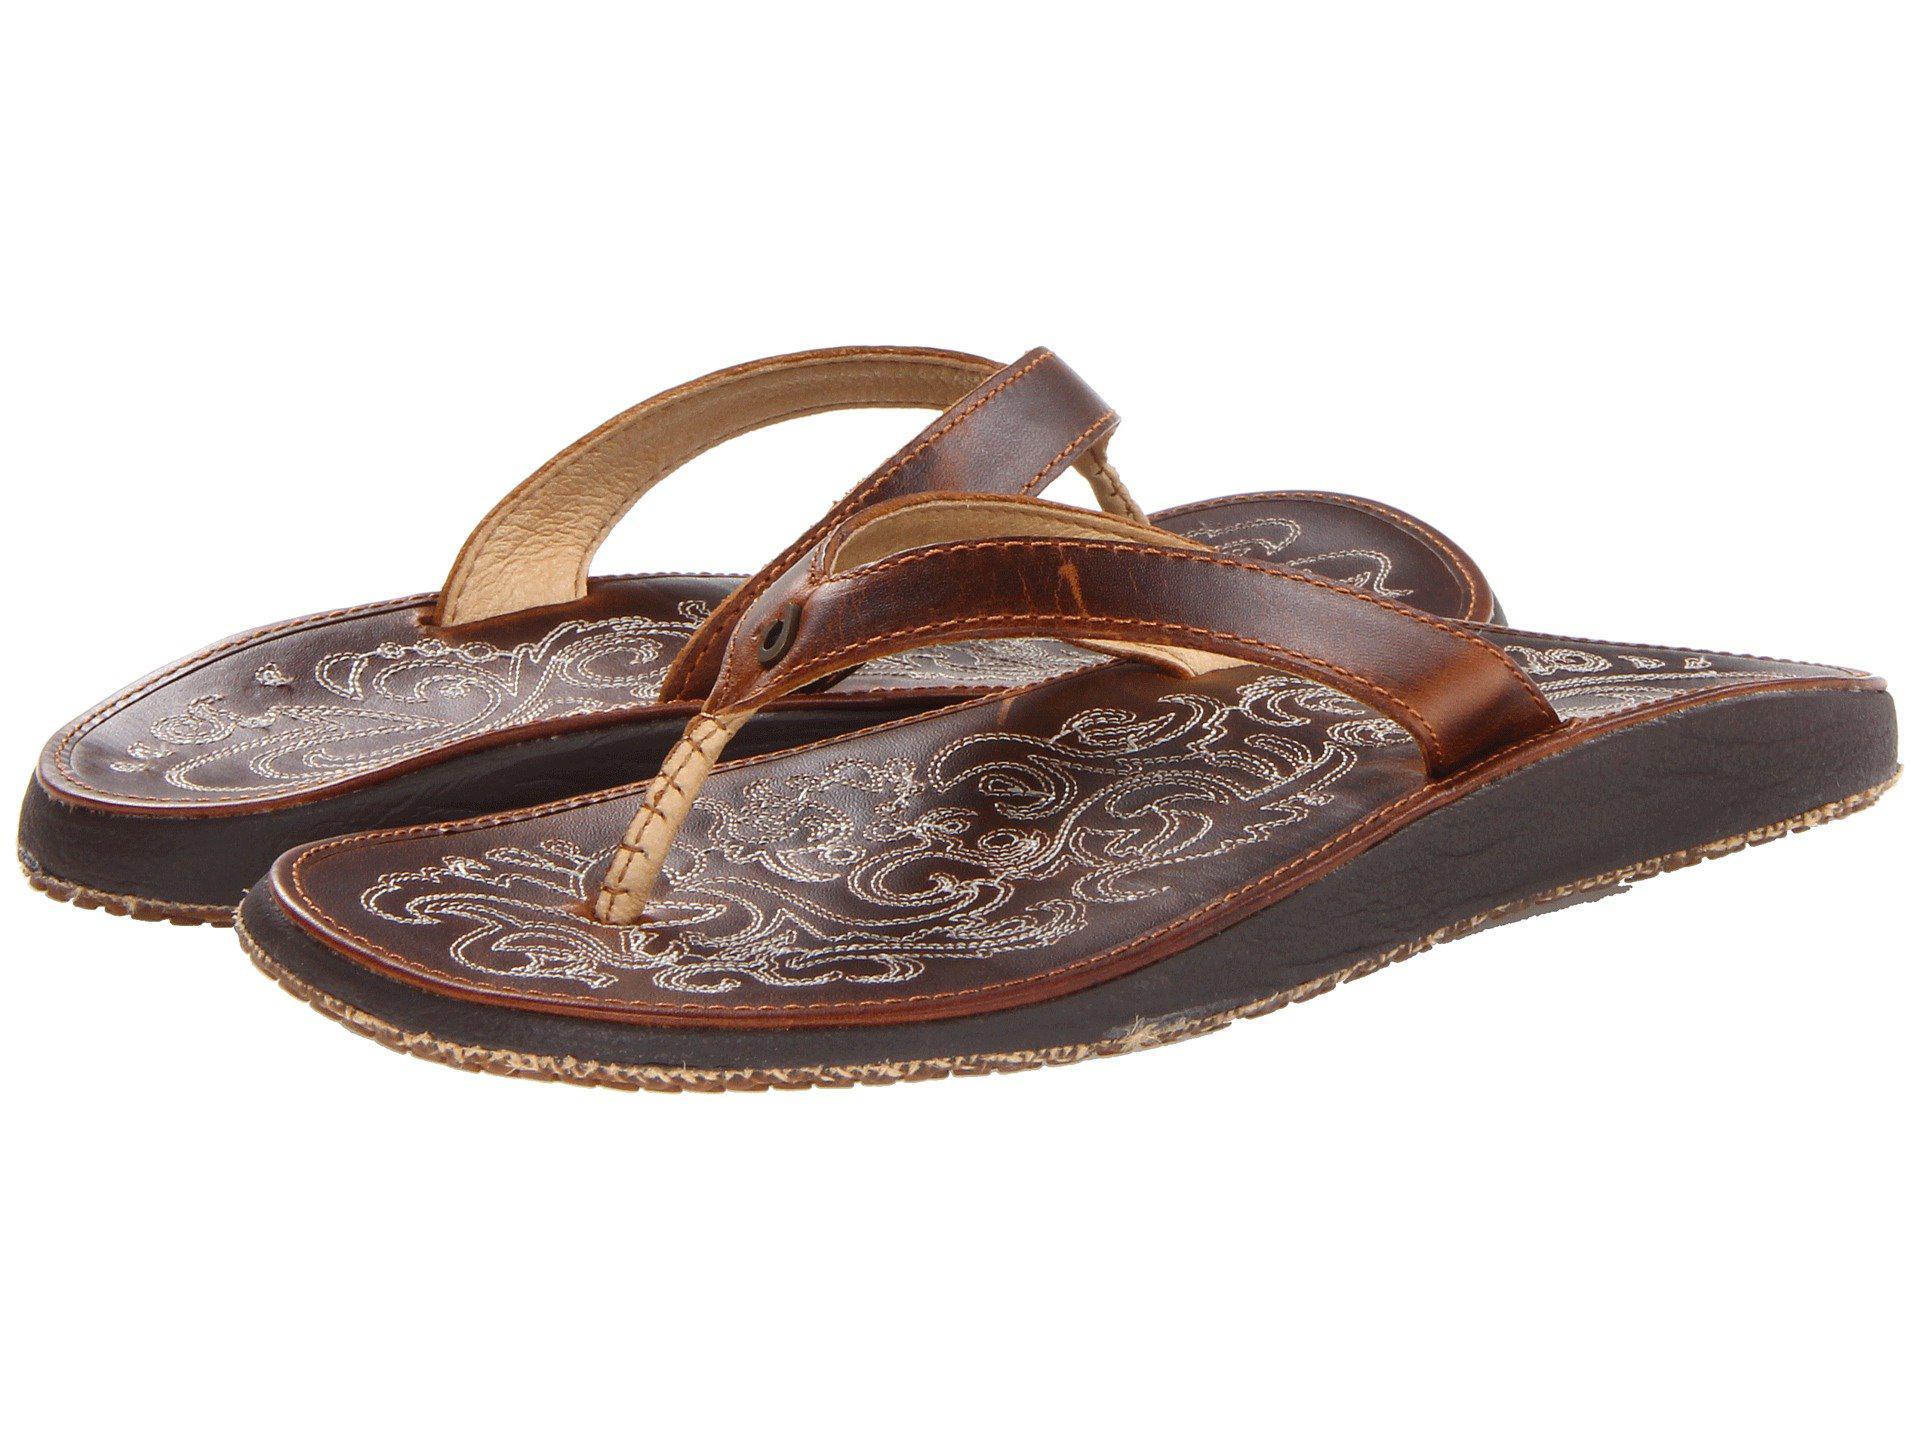 2e48404ff Lyst - Olukai Paniolo (natural natural) Women s Sandals in Natural